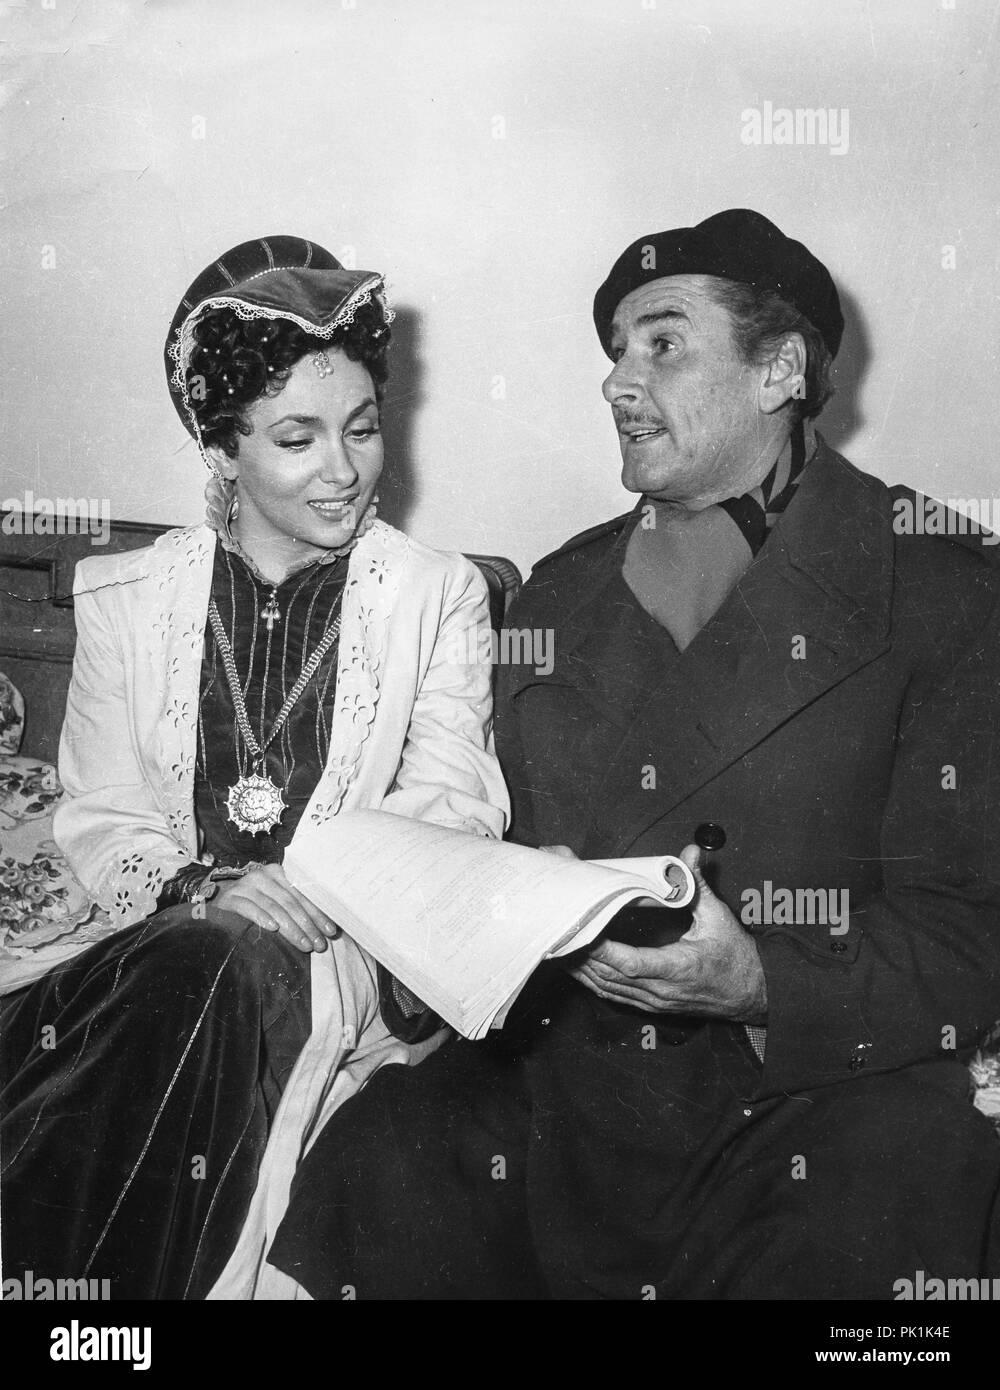 gina lollobrigida, errol flynn, on the set of the movie crossed swords, 1953 - Stock Image